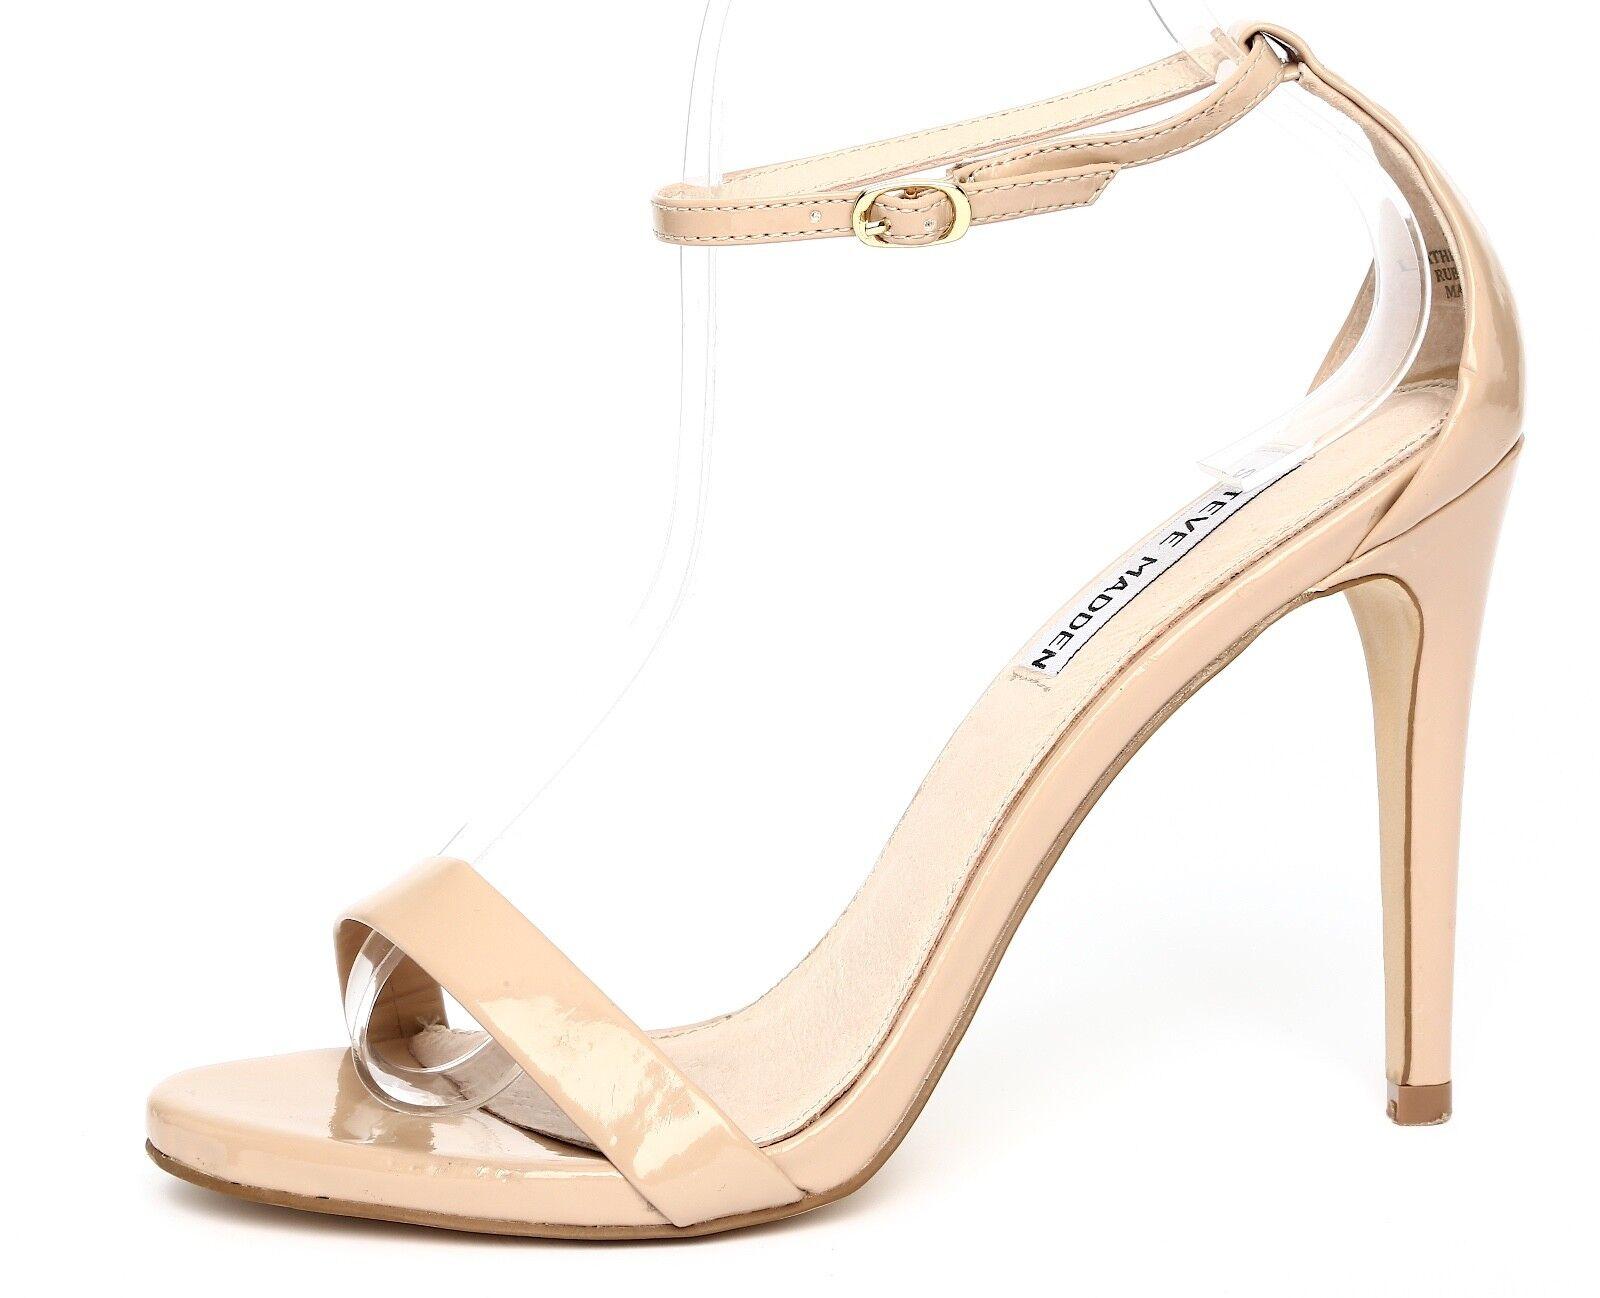 qualità ufficiale Steve Madden Stecy Patent Leather Nude Ankle Strap Sandal Sandal Sandal Heels Sz 7.5M 5115  fornire un prodotto di qualità